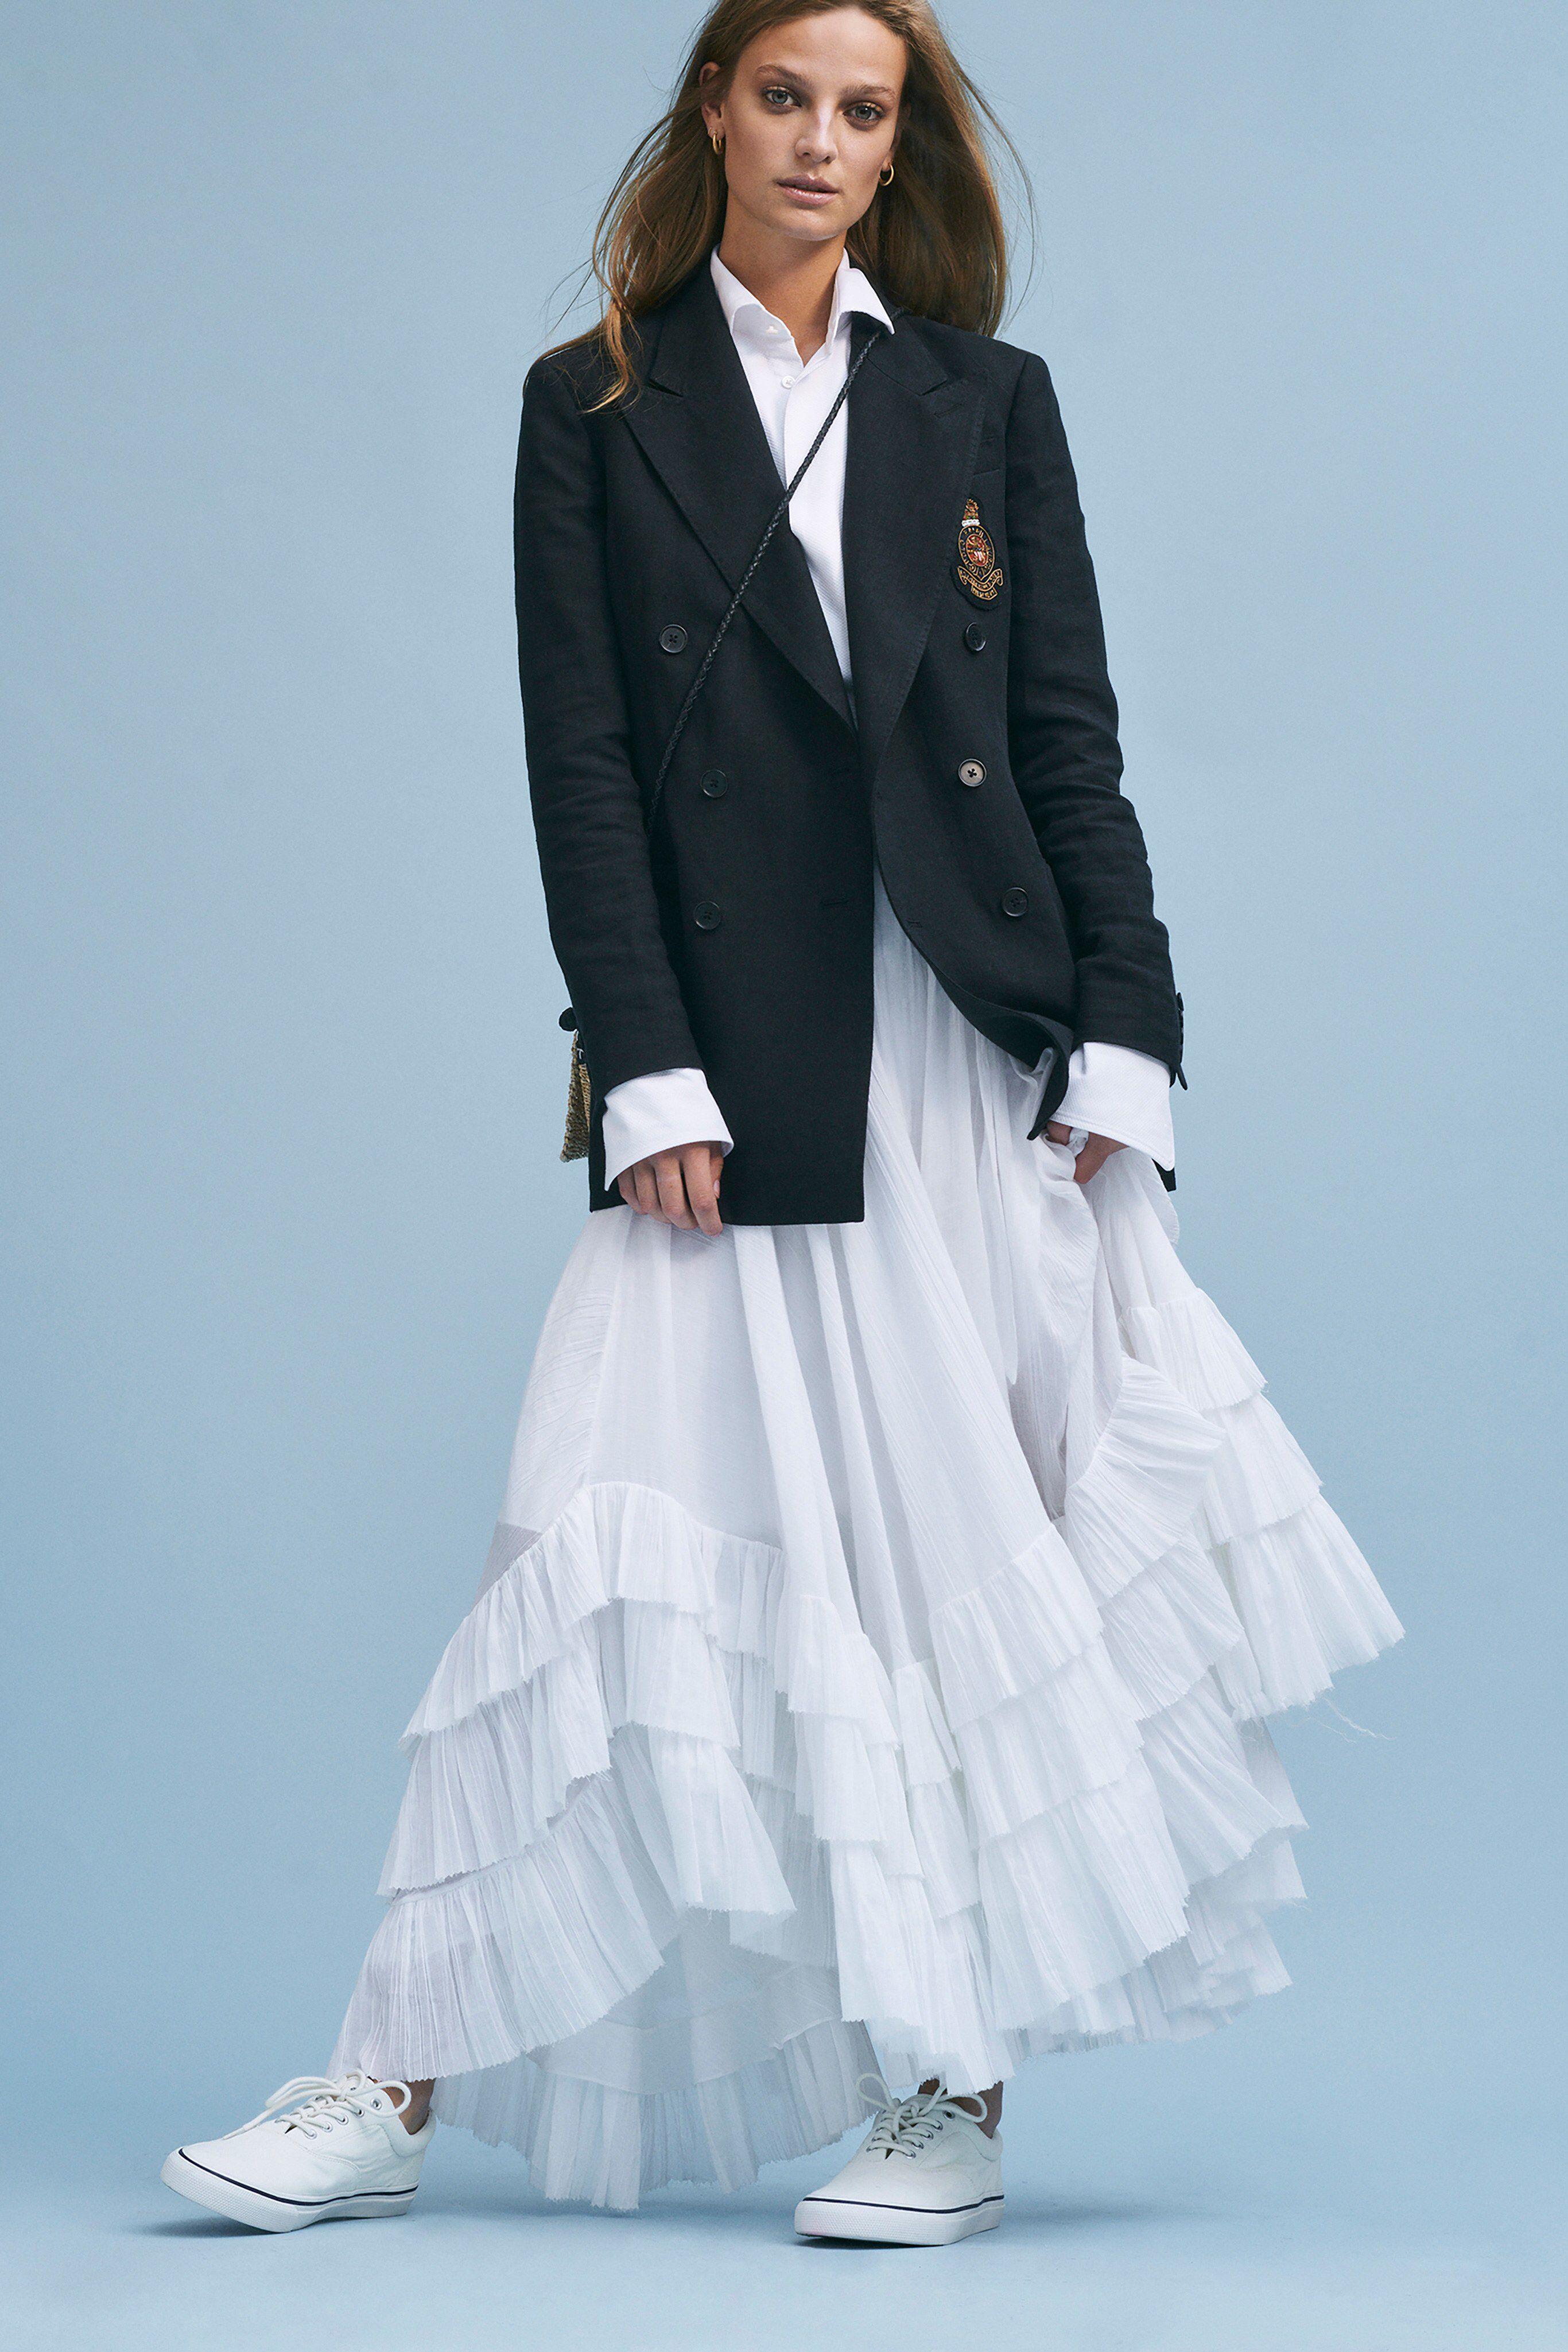 2019 Ralph Fashion Lauren Show Wear To В Ready Polo Spring Г nP8OkN0wX